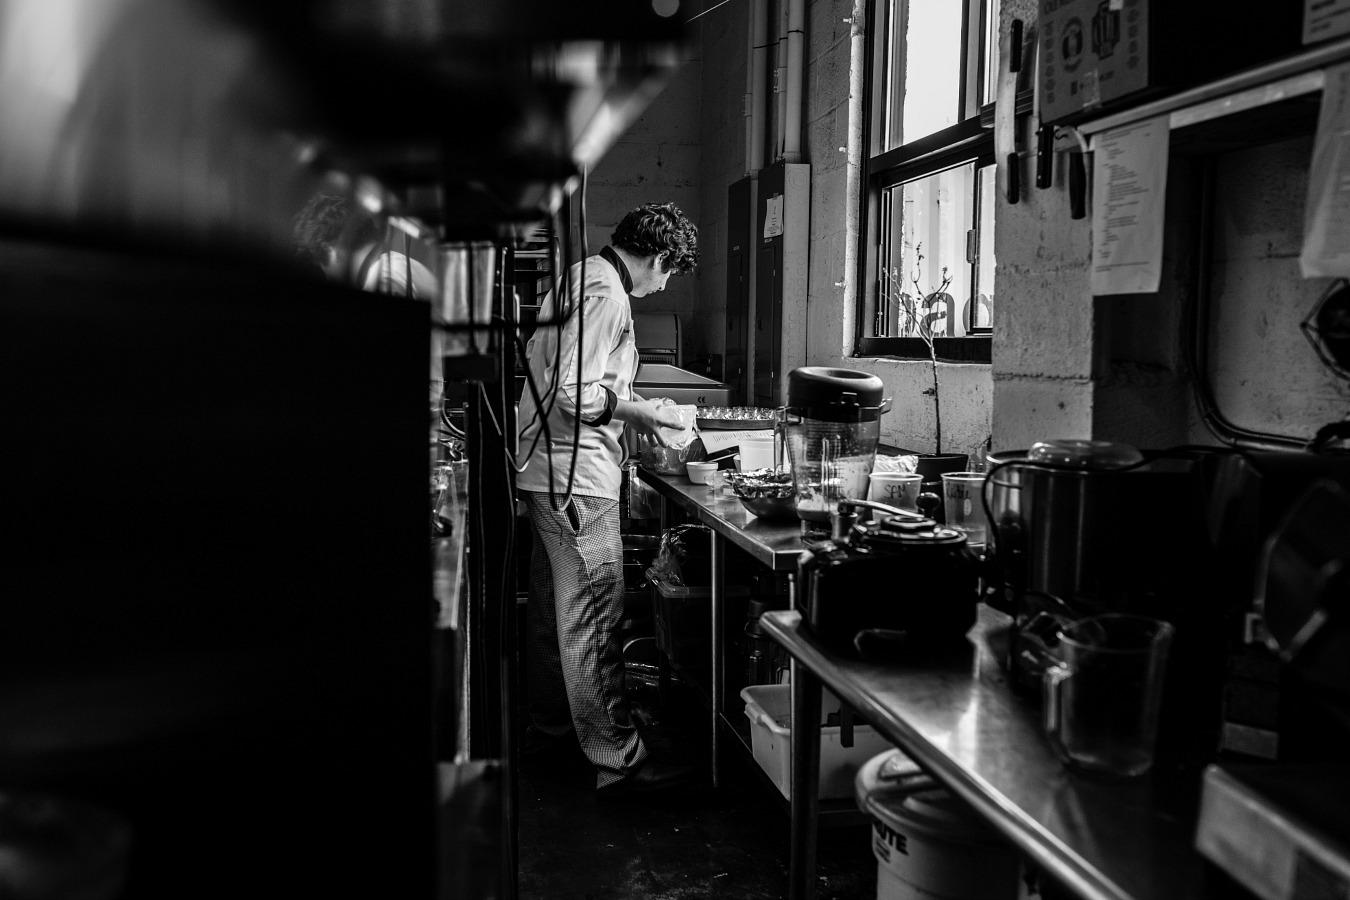 Chef & Restaurant Photographers in Virginia Beach